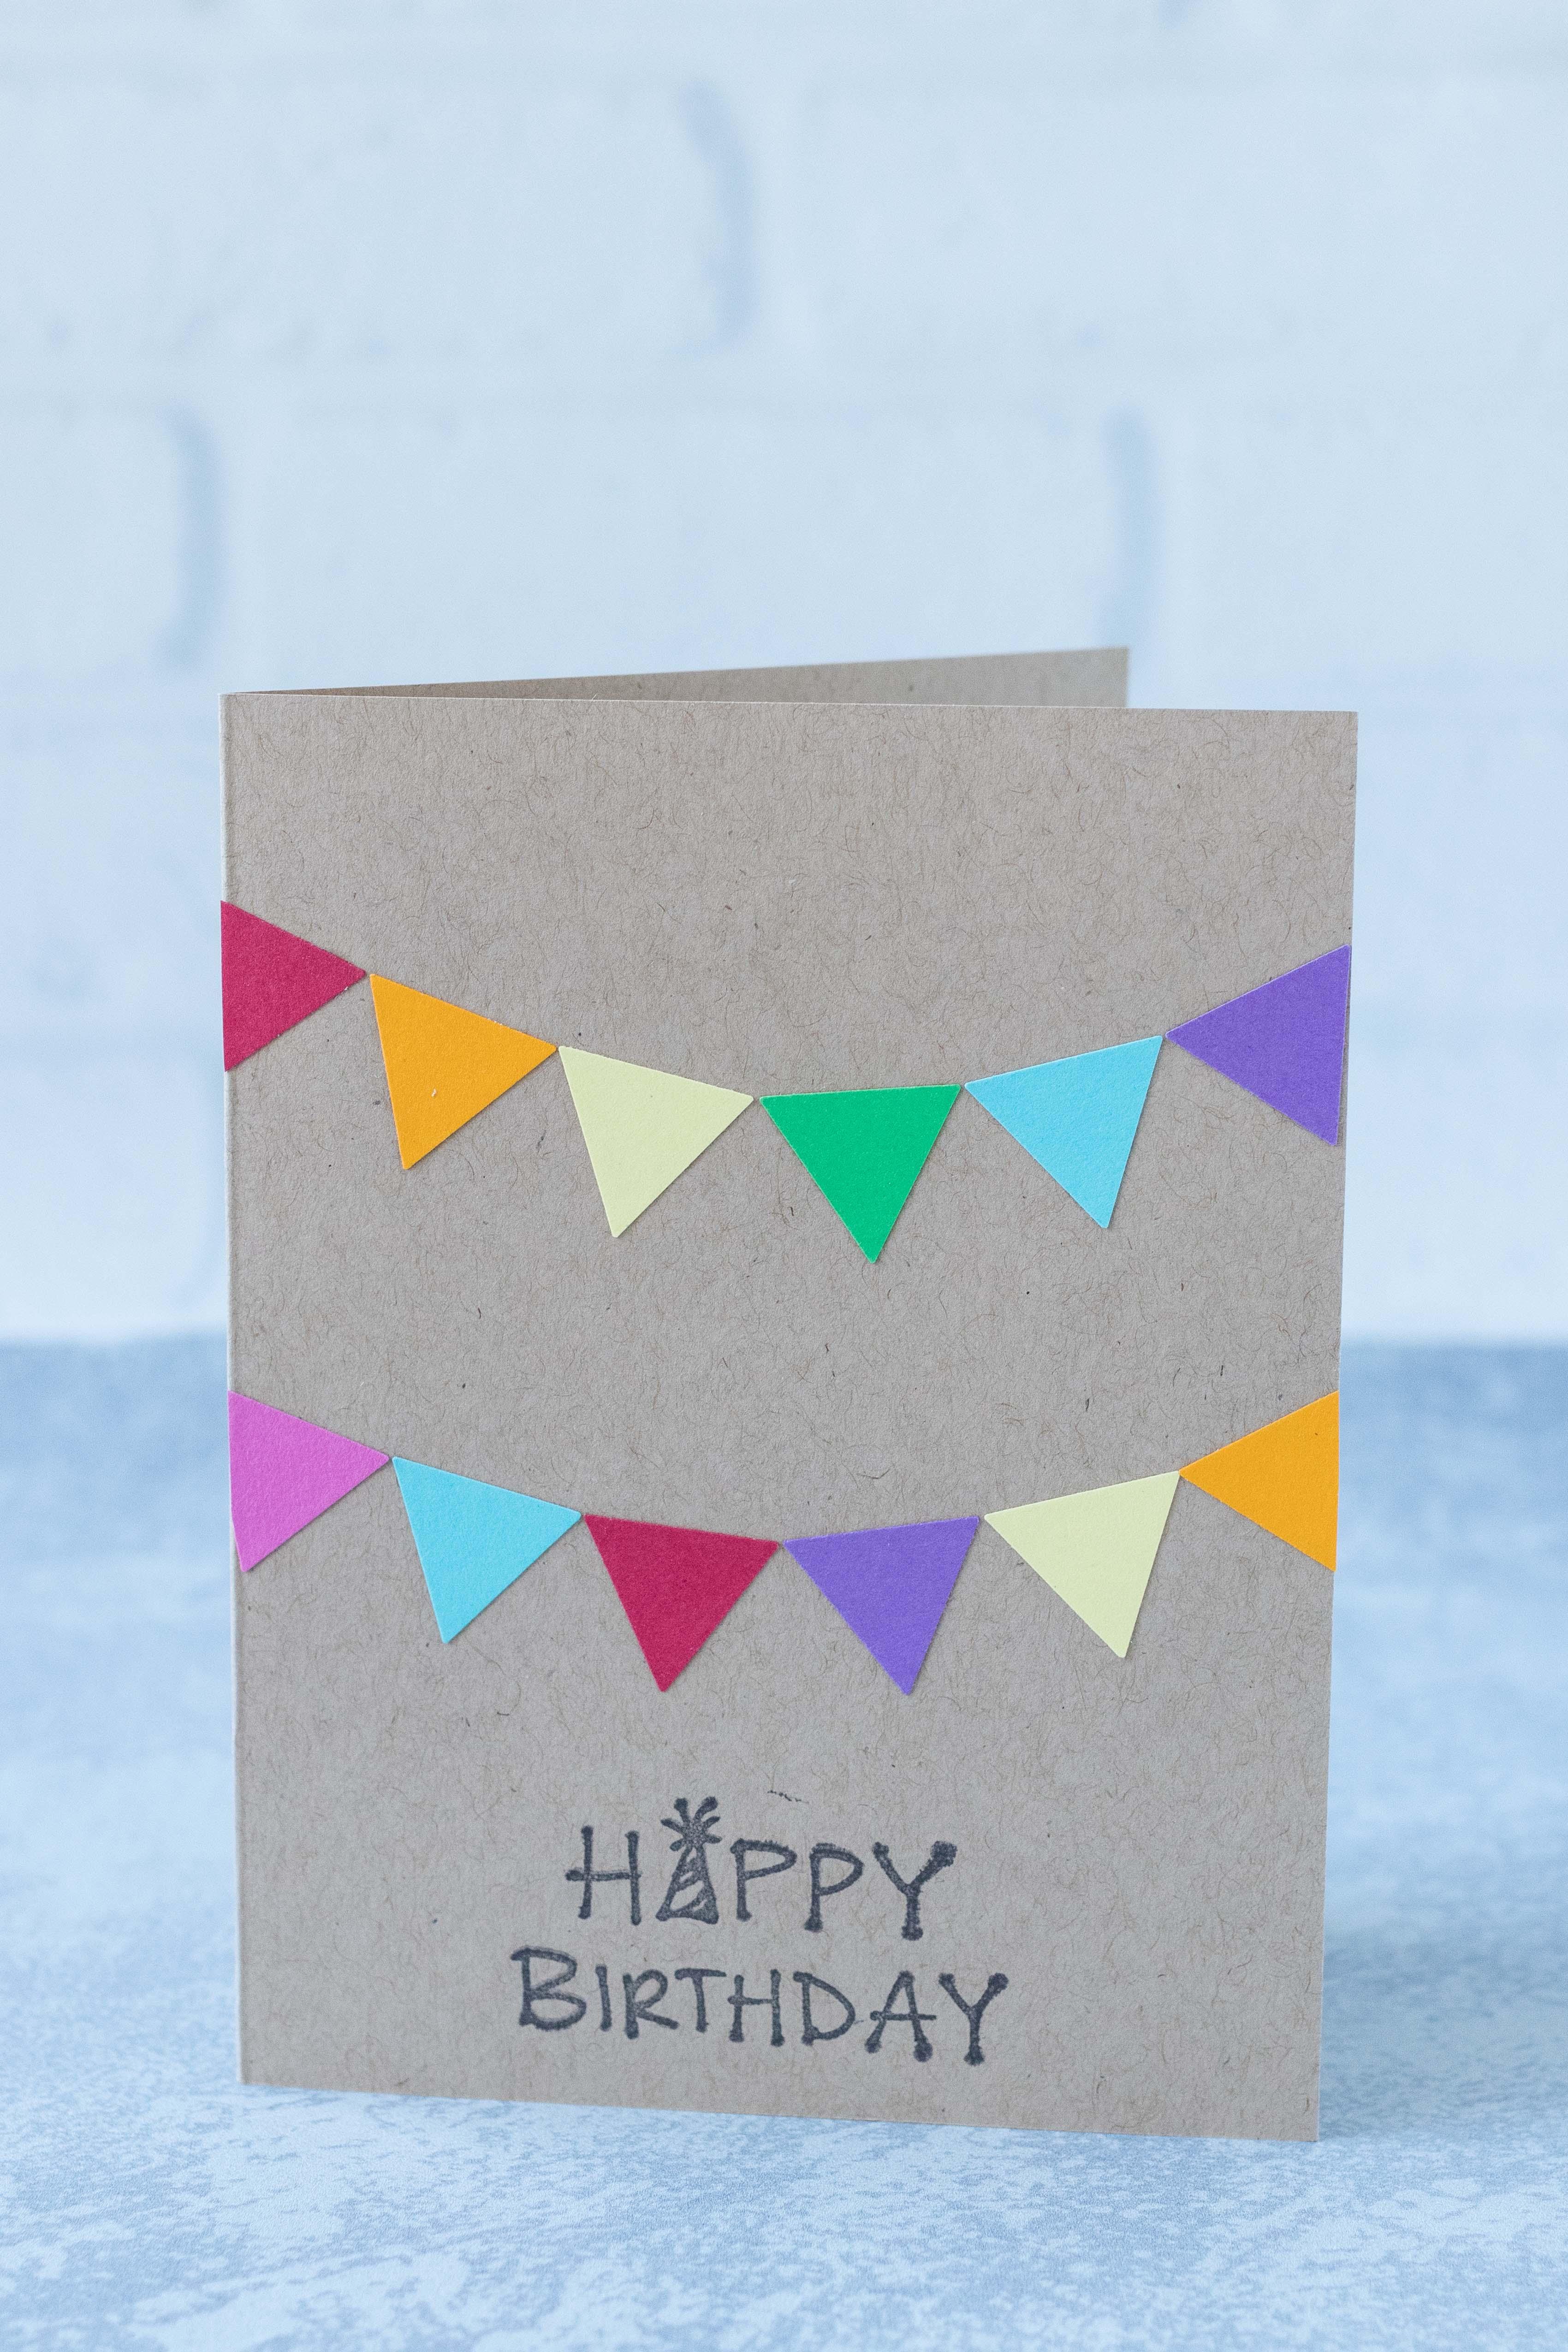 Multicolored bunting happy birthday DIY greeting card. #handmadecard #birthdaycardidea #colorfulbunting | https://www.roseclearfield.com